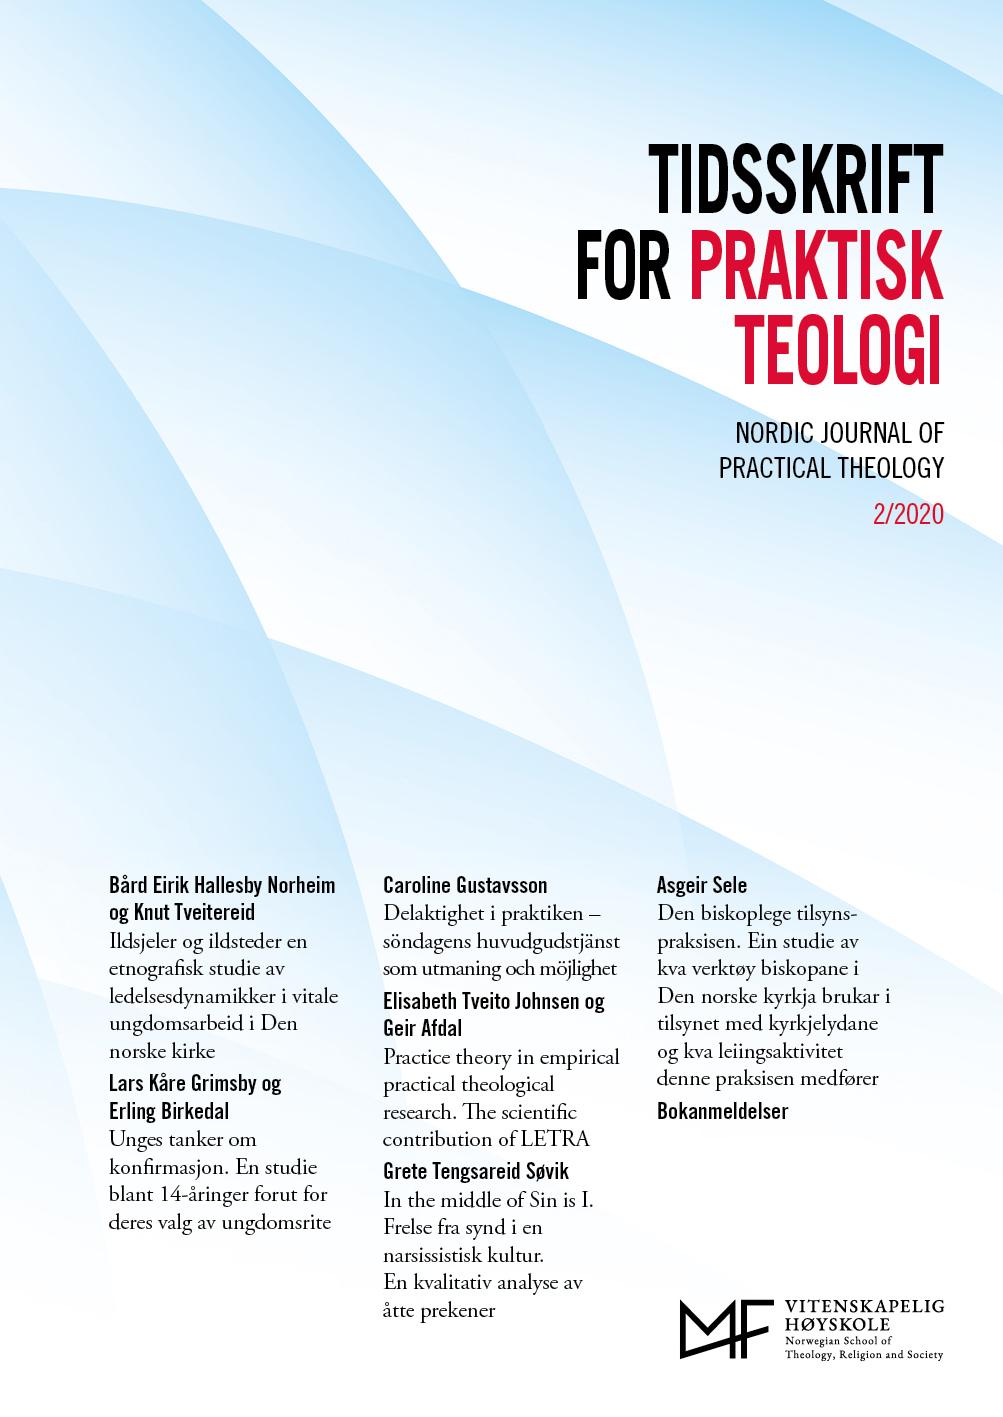 Se Vol 37 Nr 2 (2020): Tidsskrift for praktisk teologi